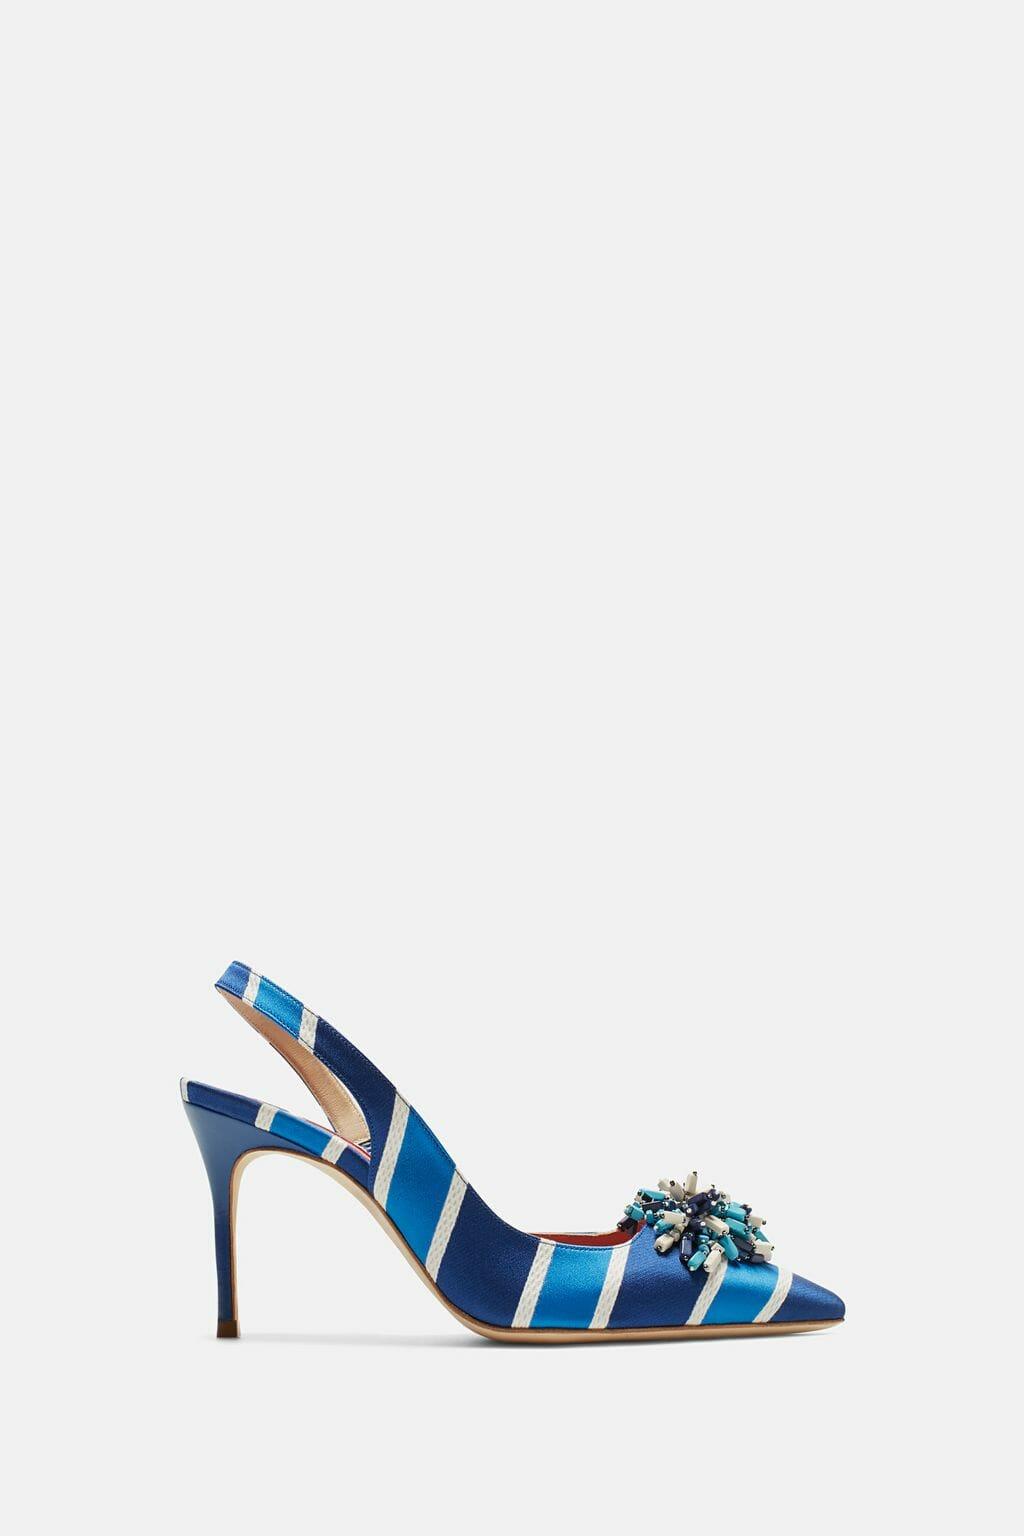 CH-Carolina-herrera-shoes-collection-Spring-Summer-2018-shoe-8